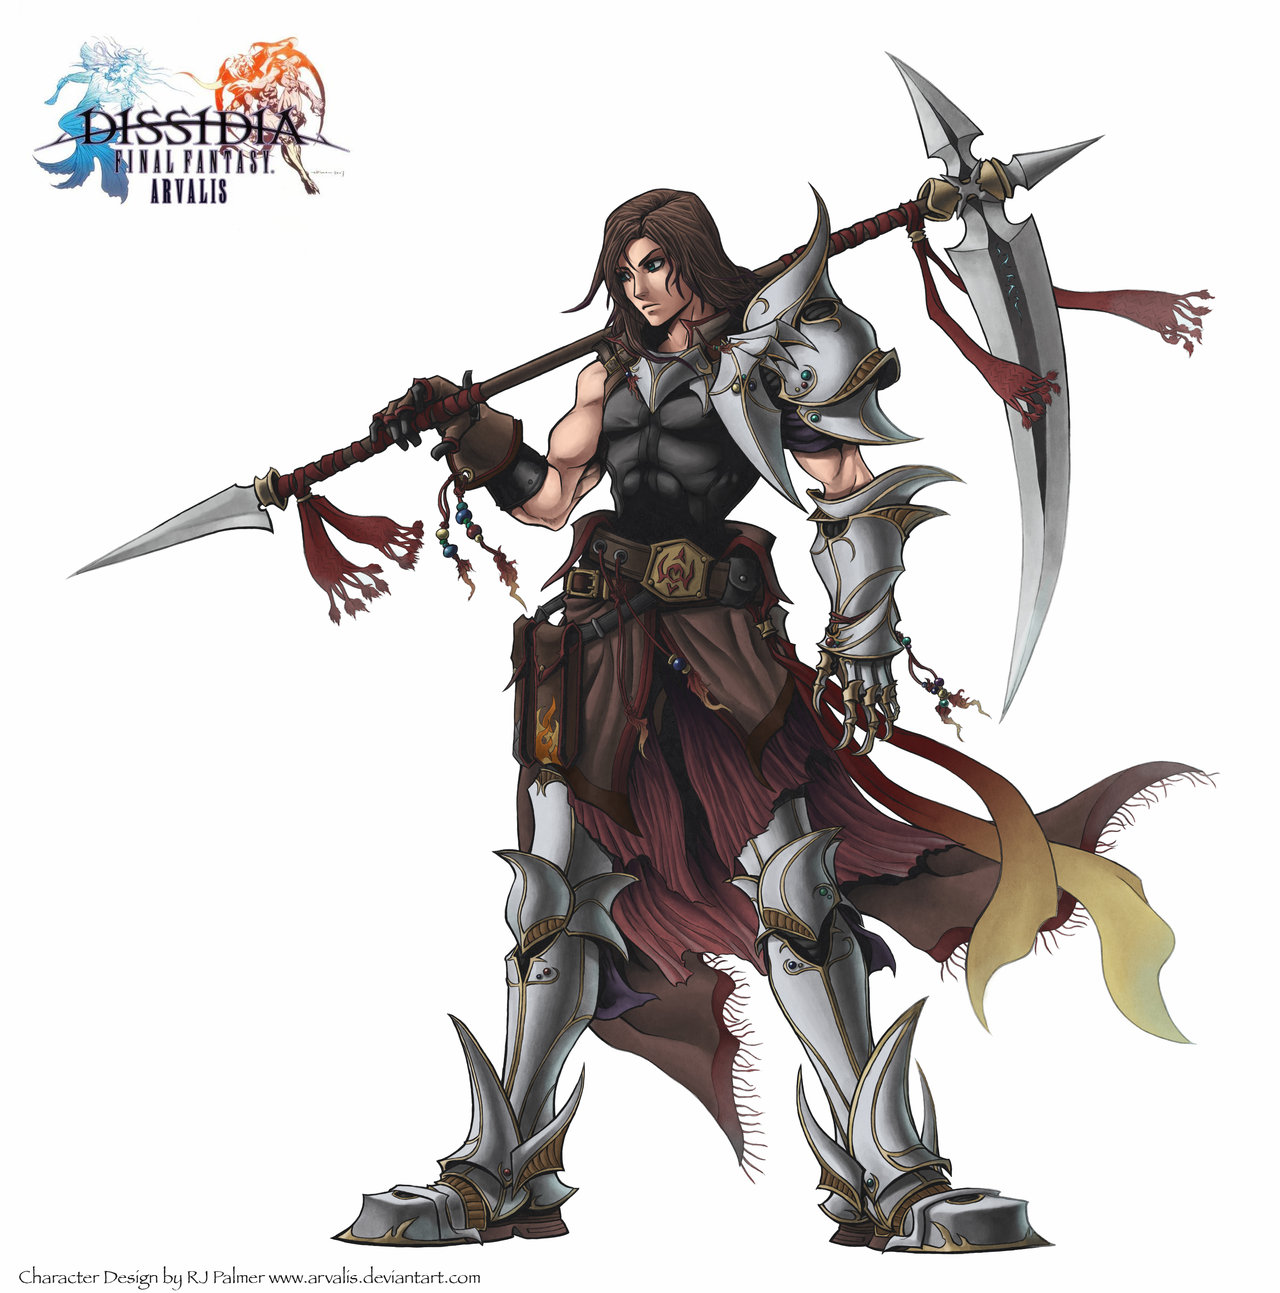 Dissidia Final Fantasy-Arvalis